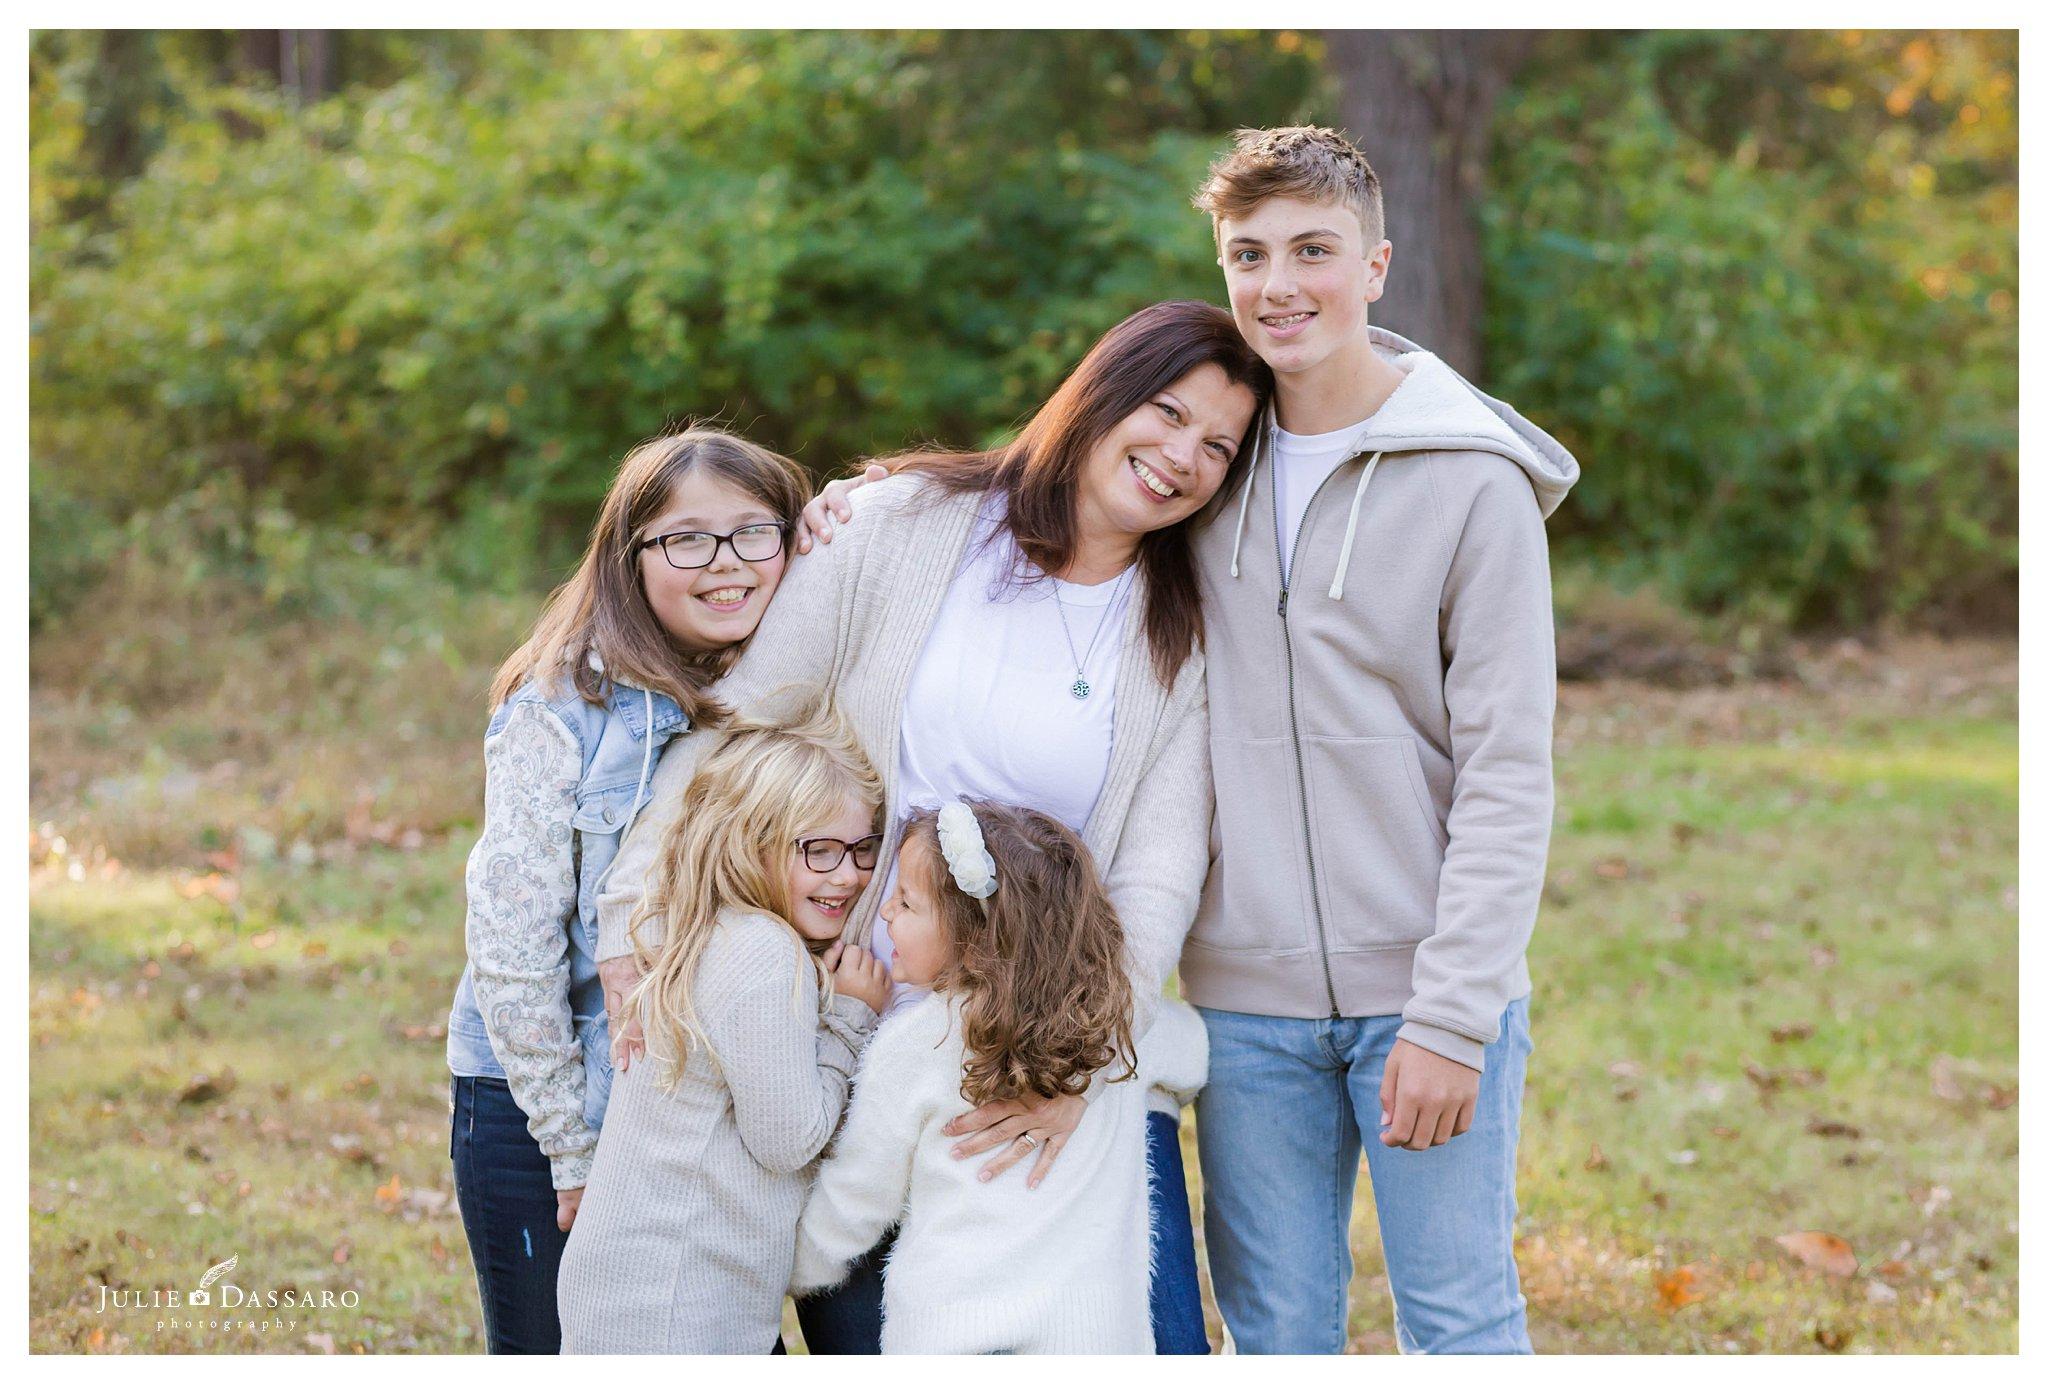 Hillsborough NJ Family Portrait